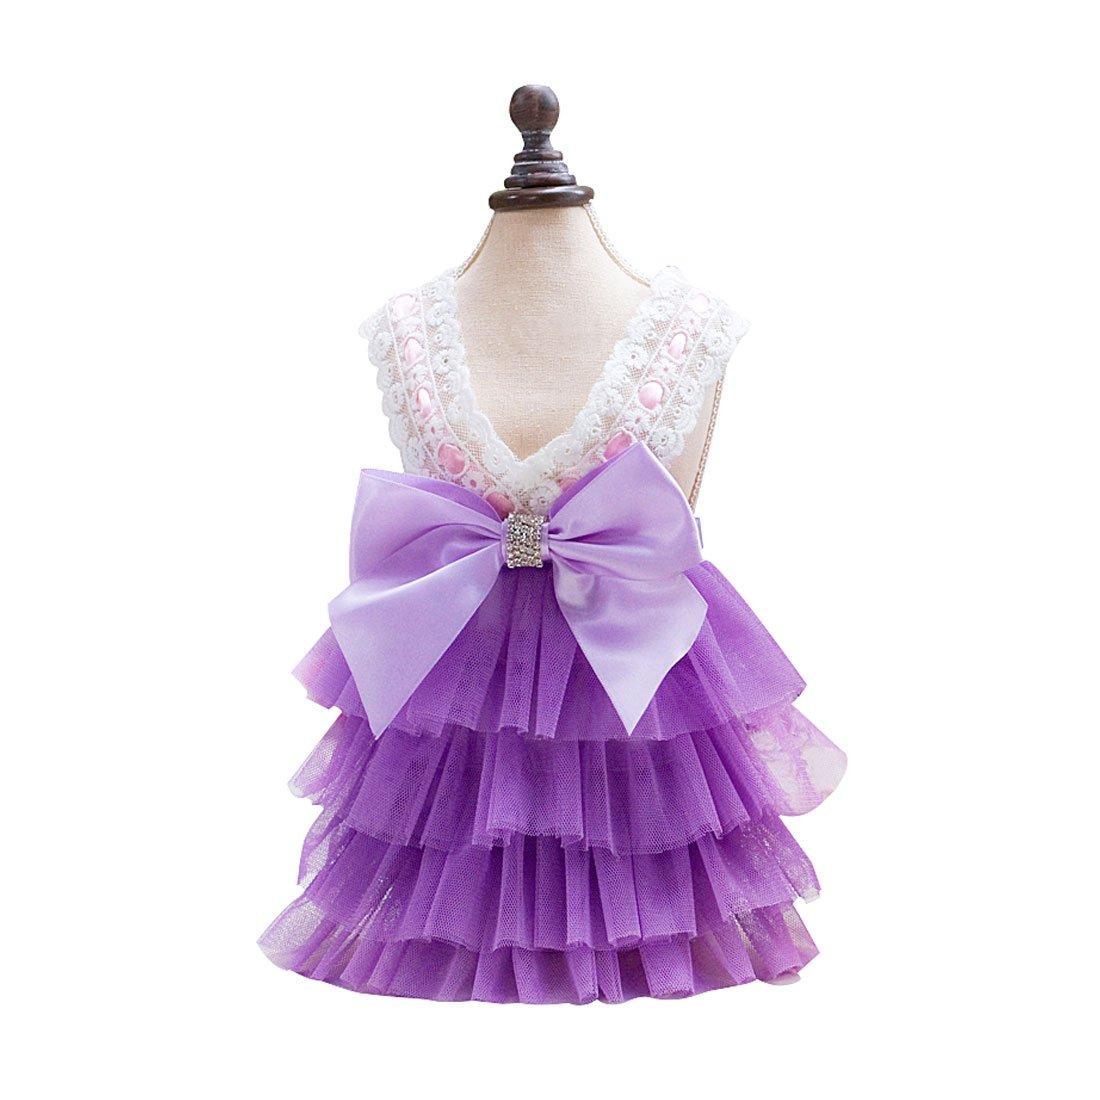 sourcingmap Falda de moda Princesa para cachorro de Perro MascotaTutu vestido de verano a17042000ux0522